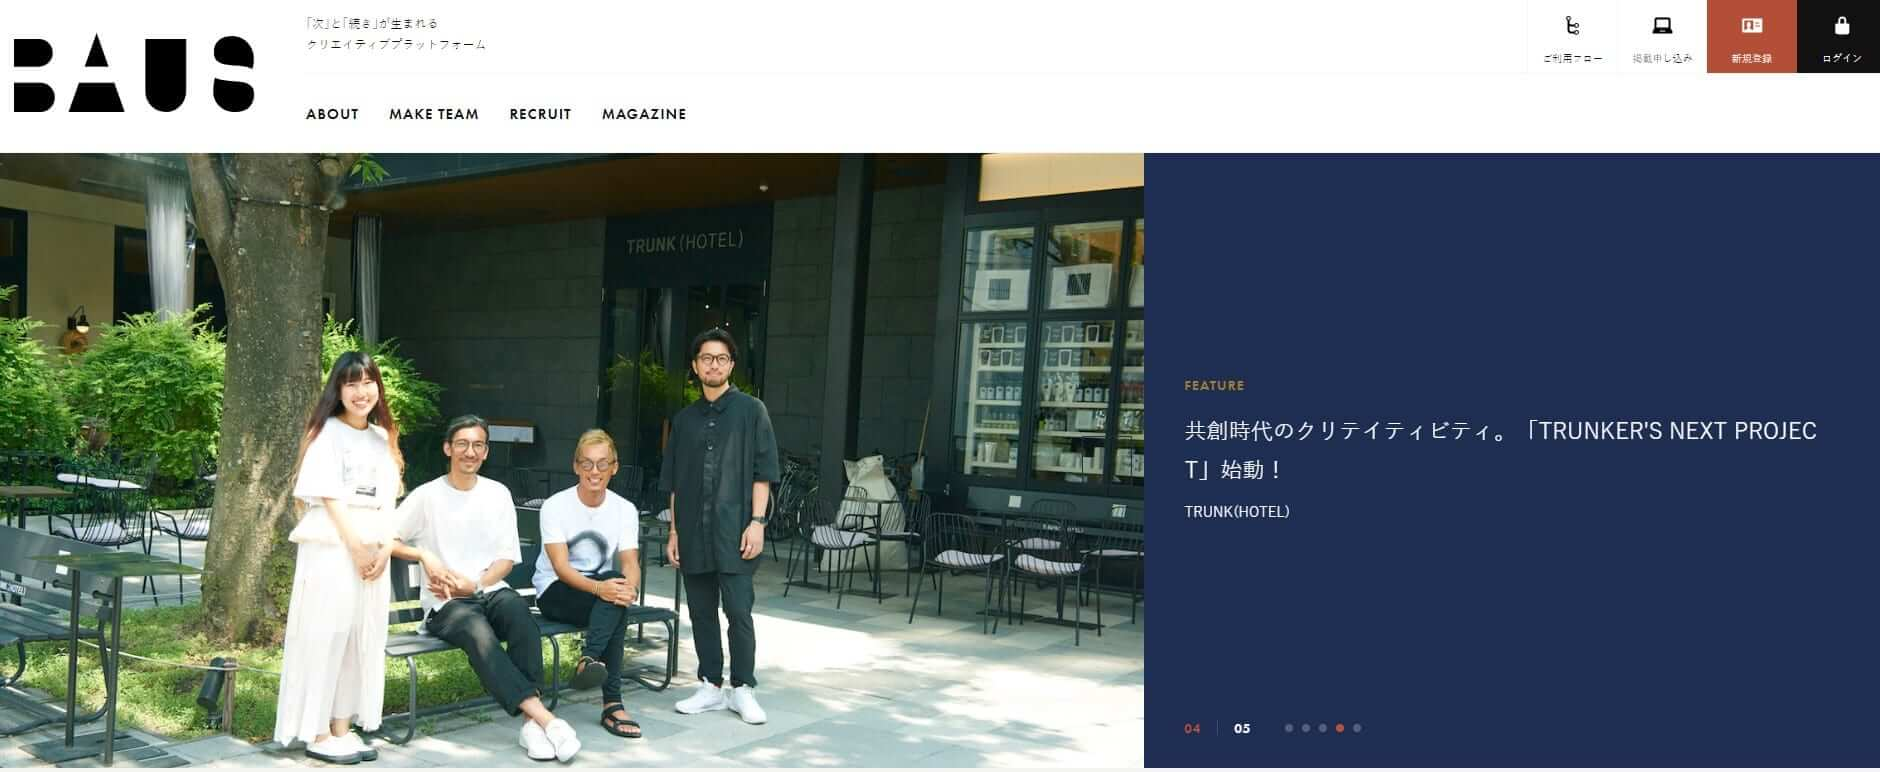 BAUSのホームページ画像